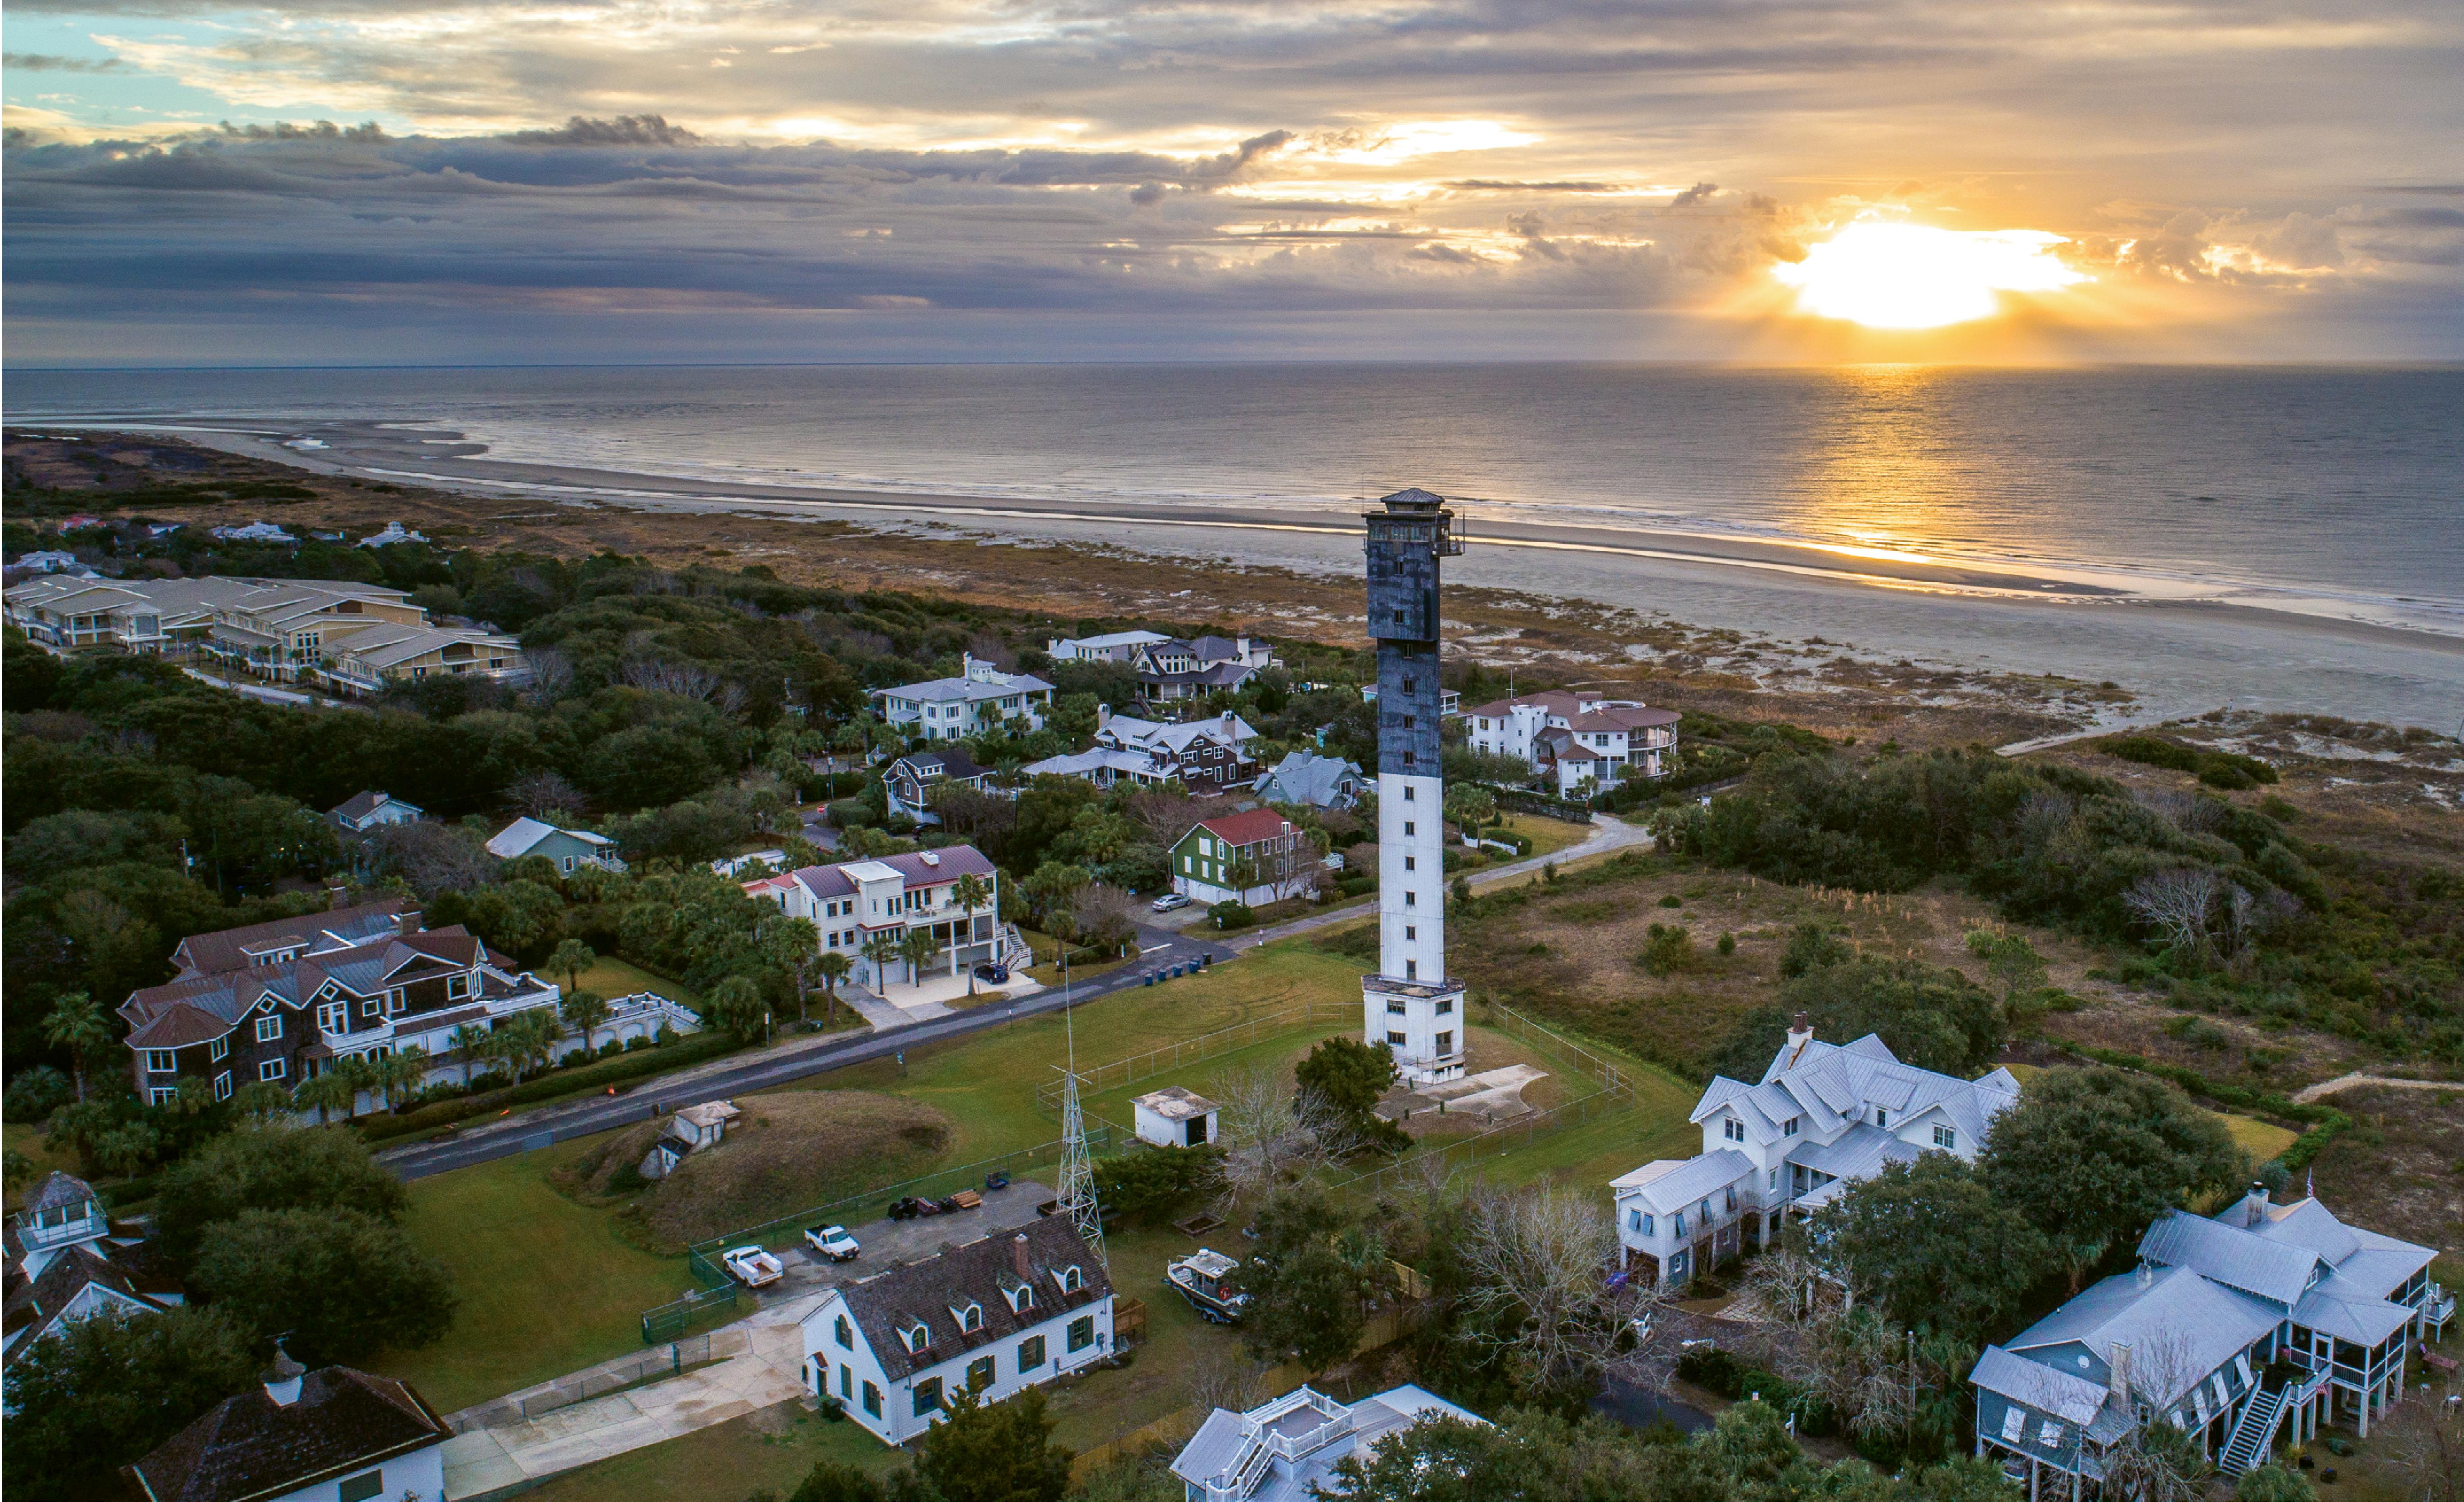 """Charleston Light, Winter Sunrise""  {Altitude: 190 feet}  The Sullivan's Island lighthouse amidst a chilly December sunrise"